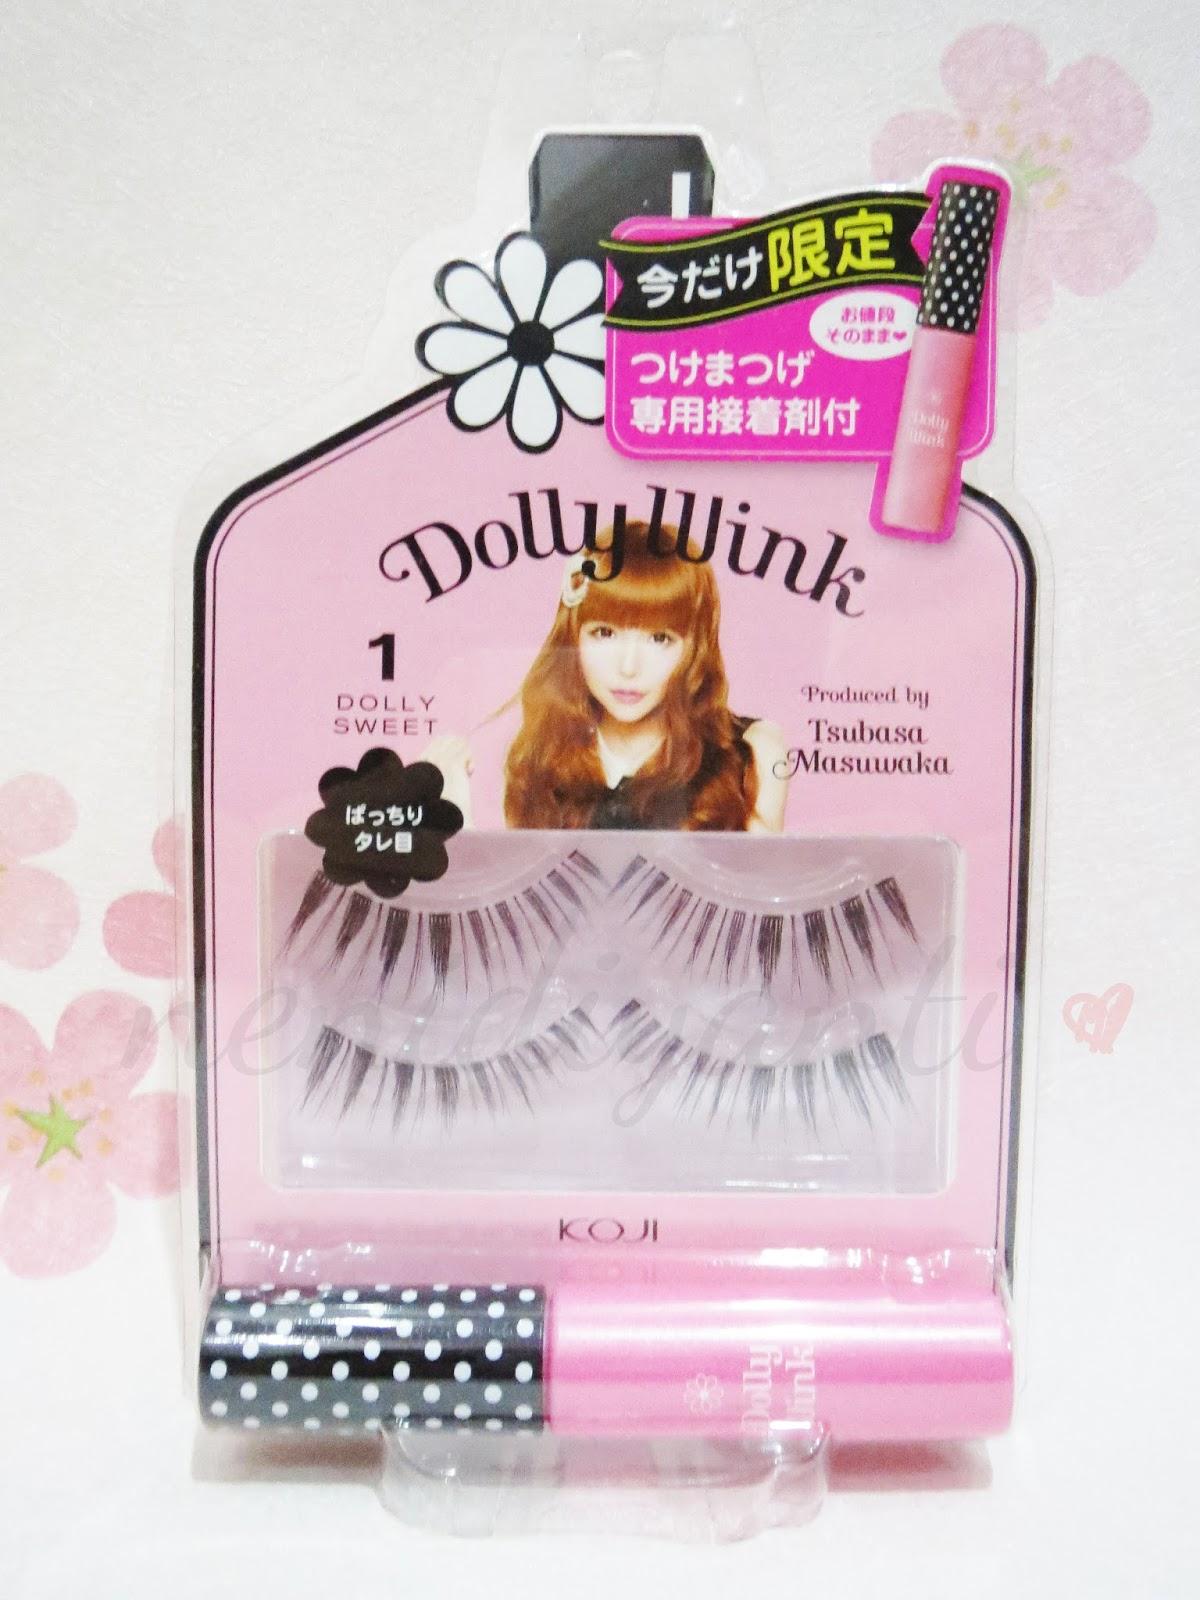 Kawaii Fuku Dolly Wink False Eyelashes 1 Dolly Sweet